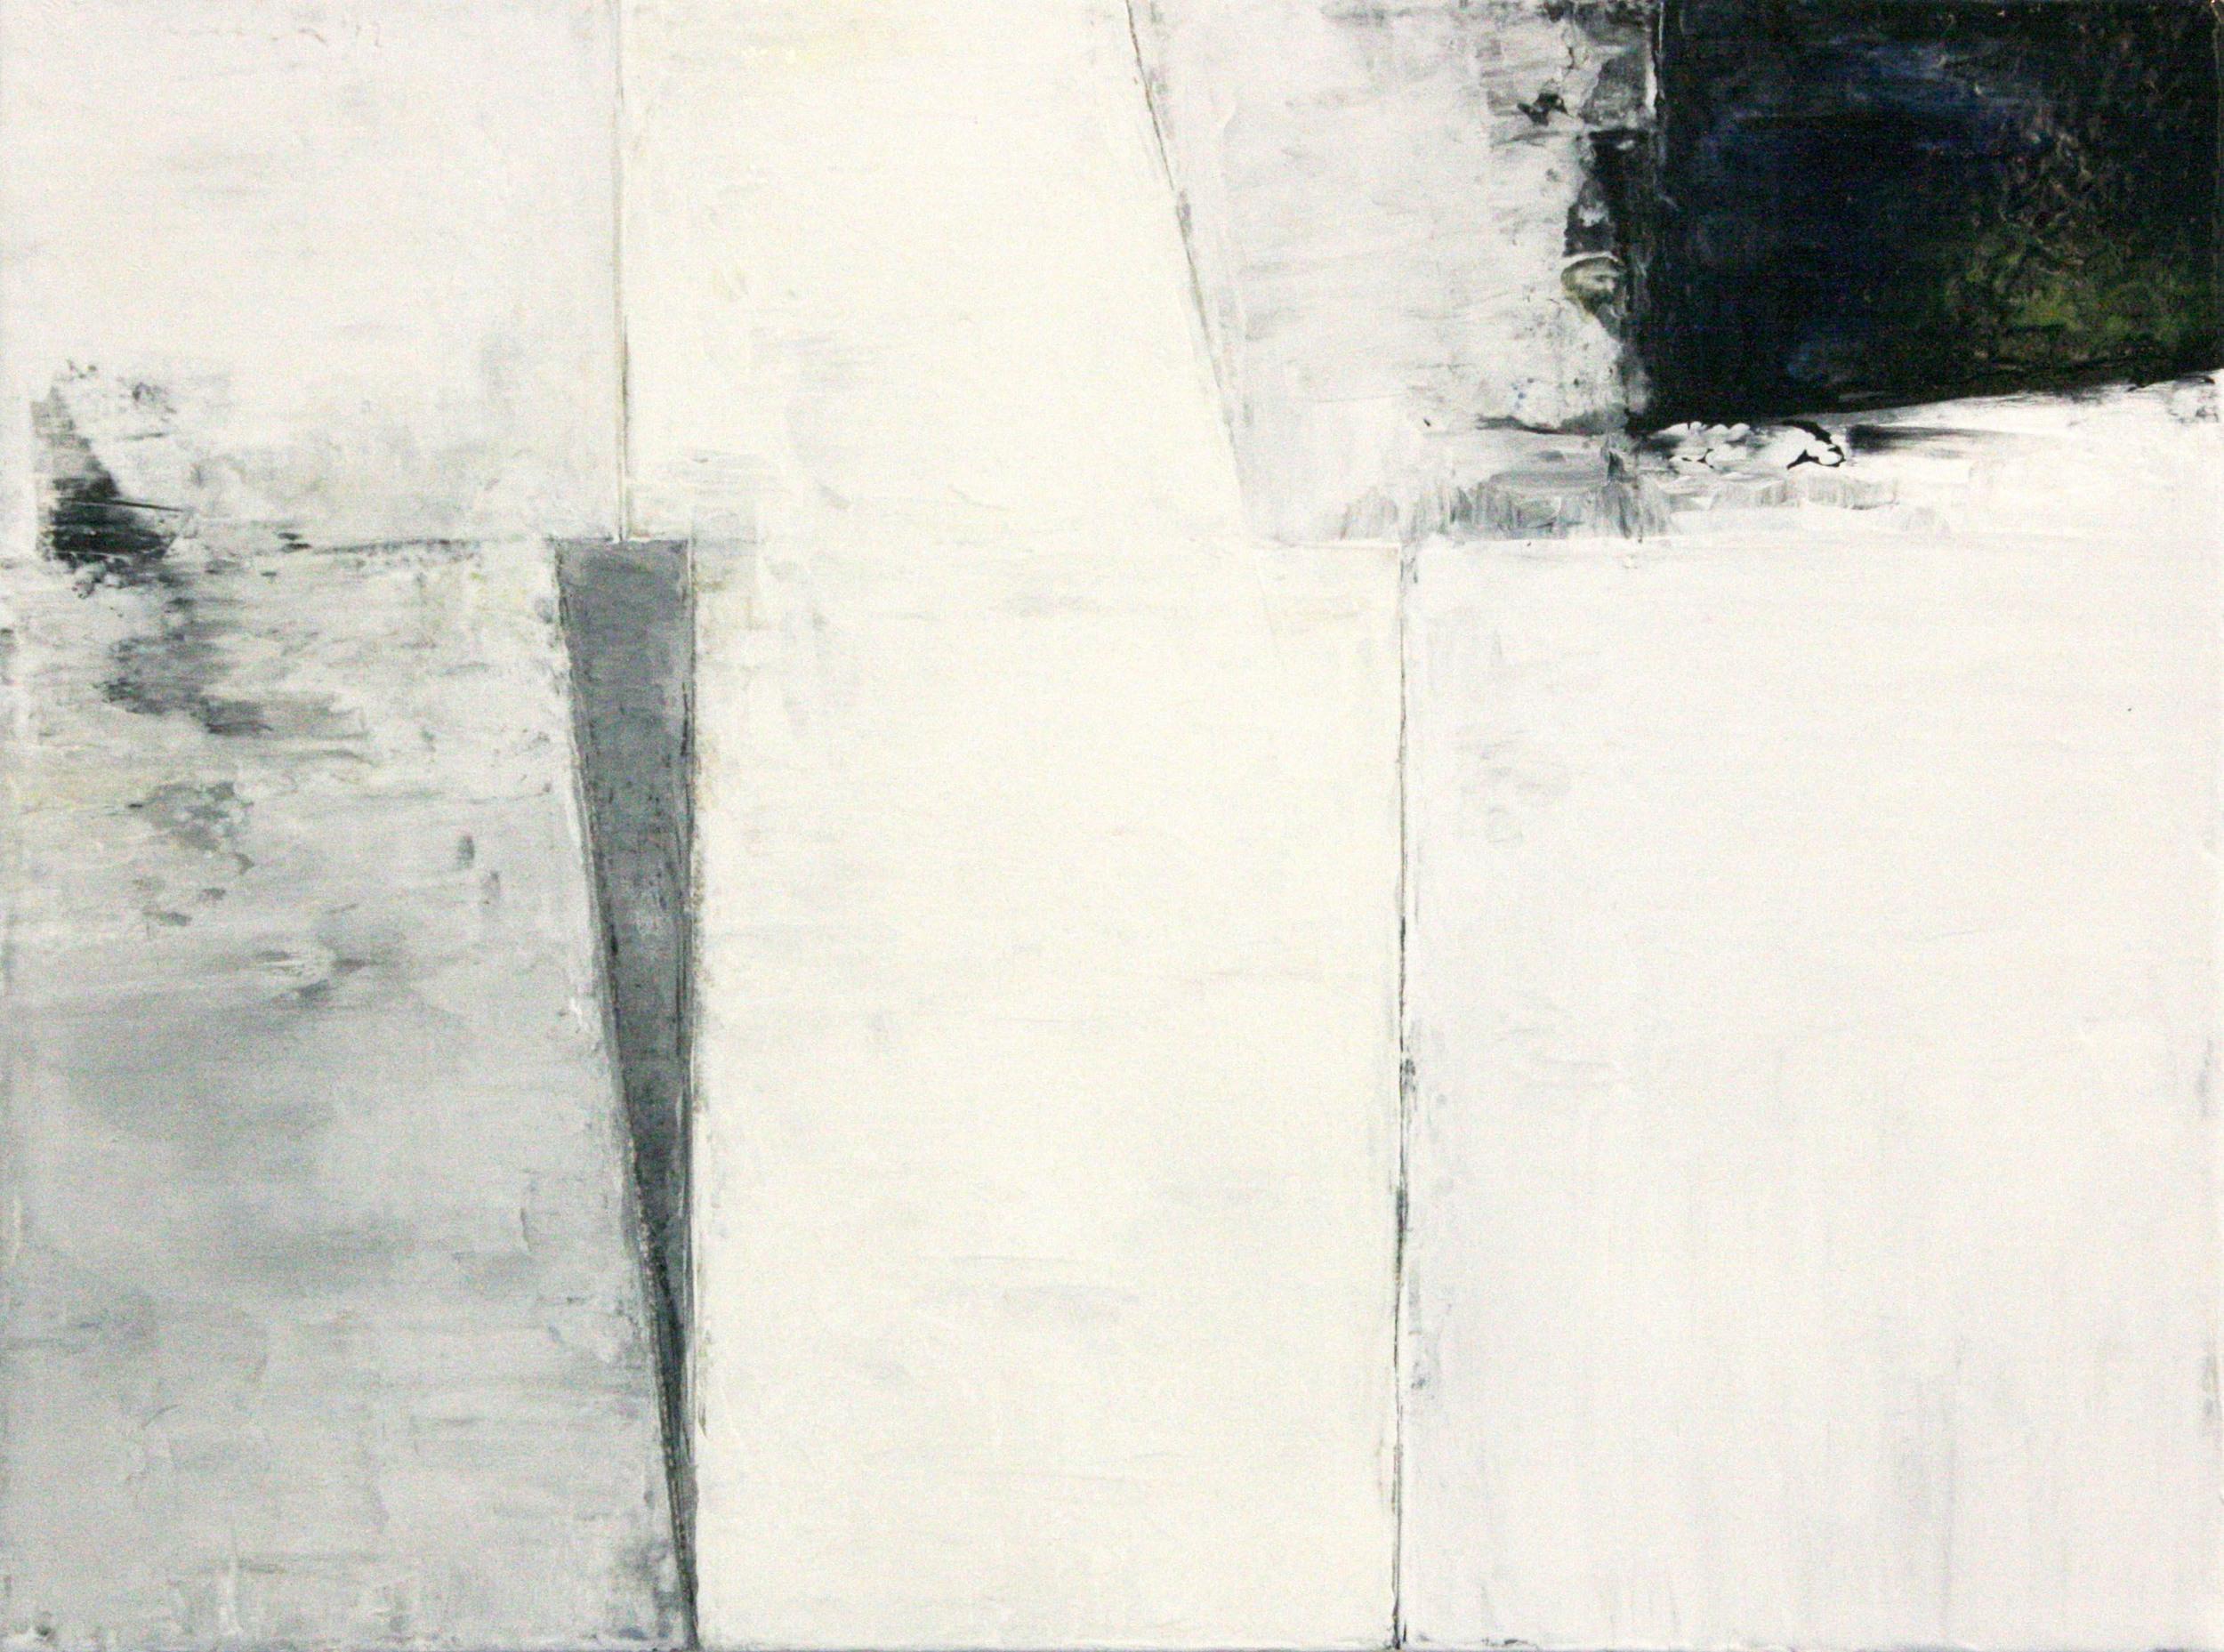 Envoi #3  , 2014 oil on canvas, 12 x 16 inches